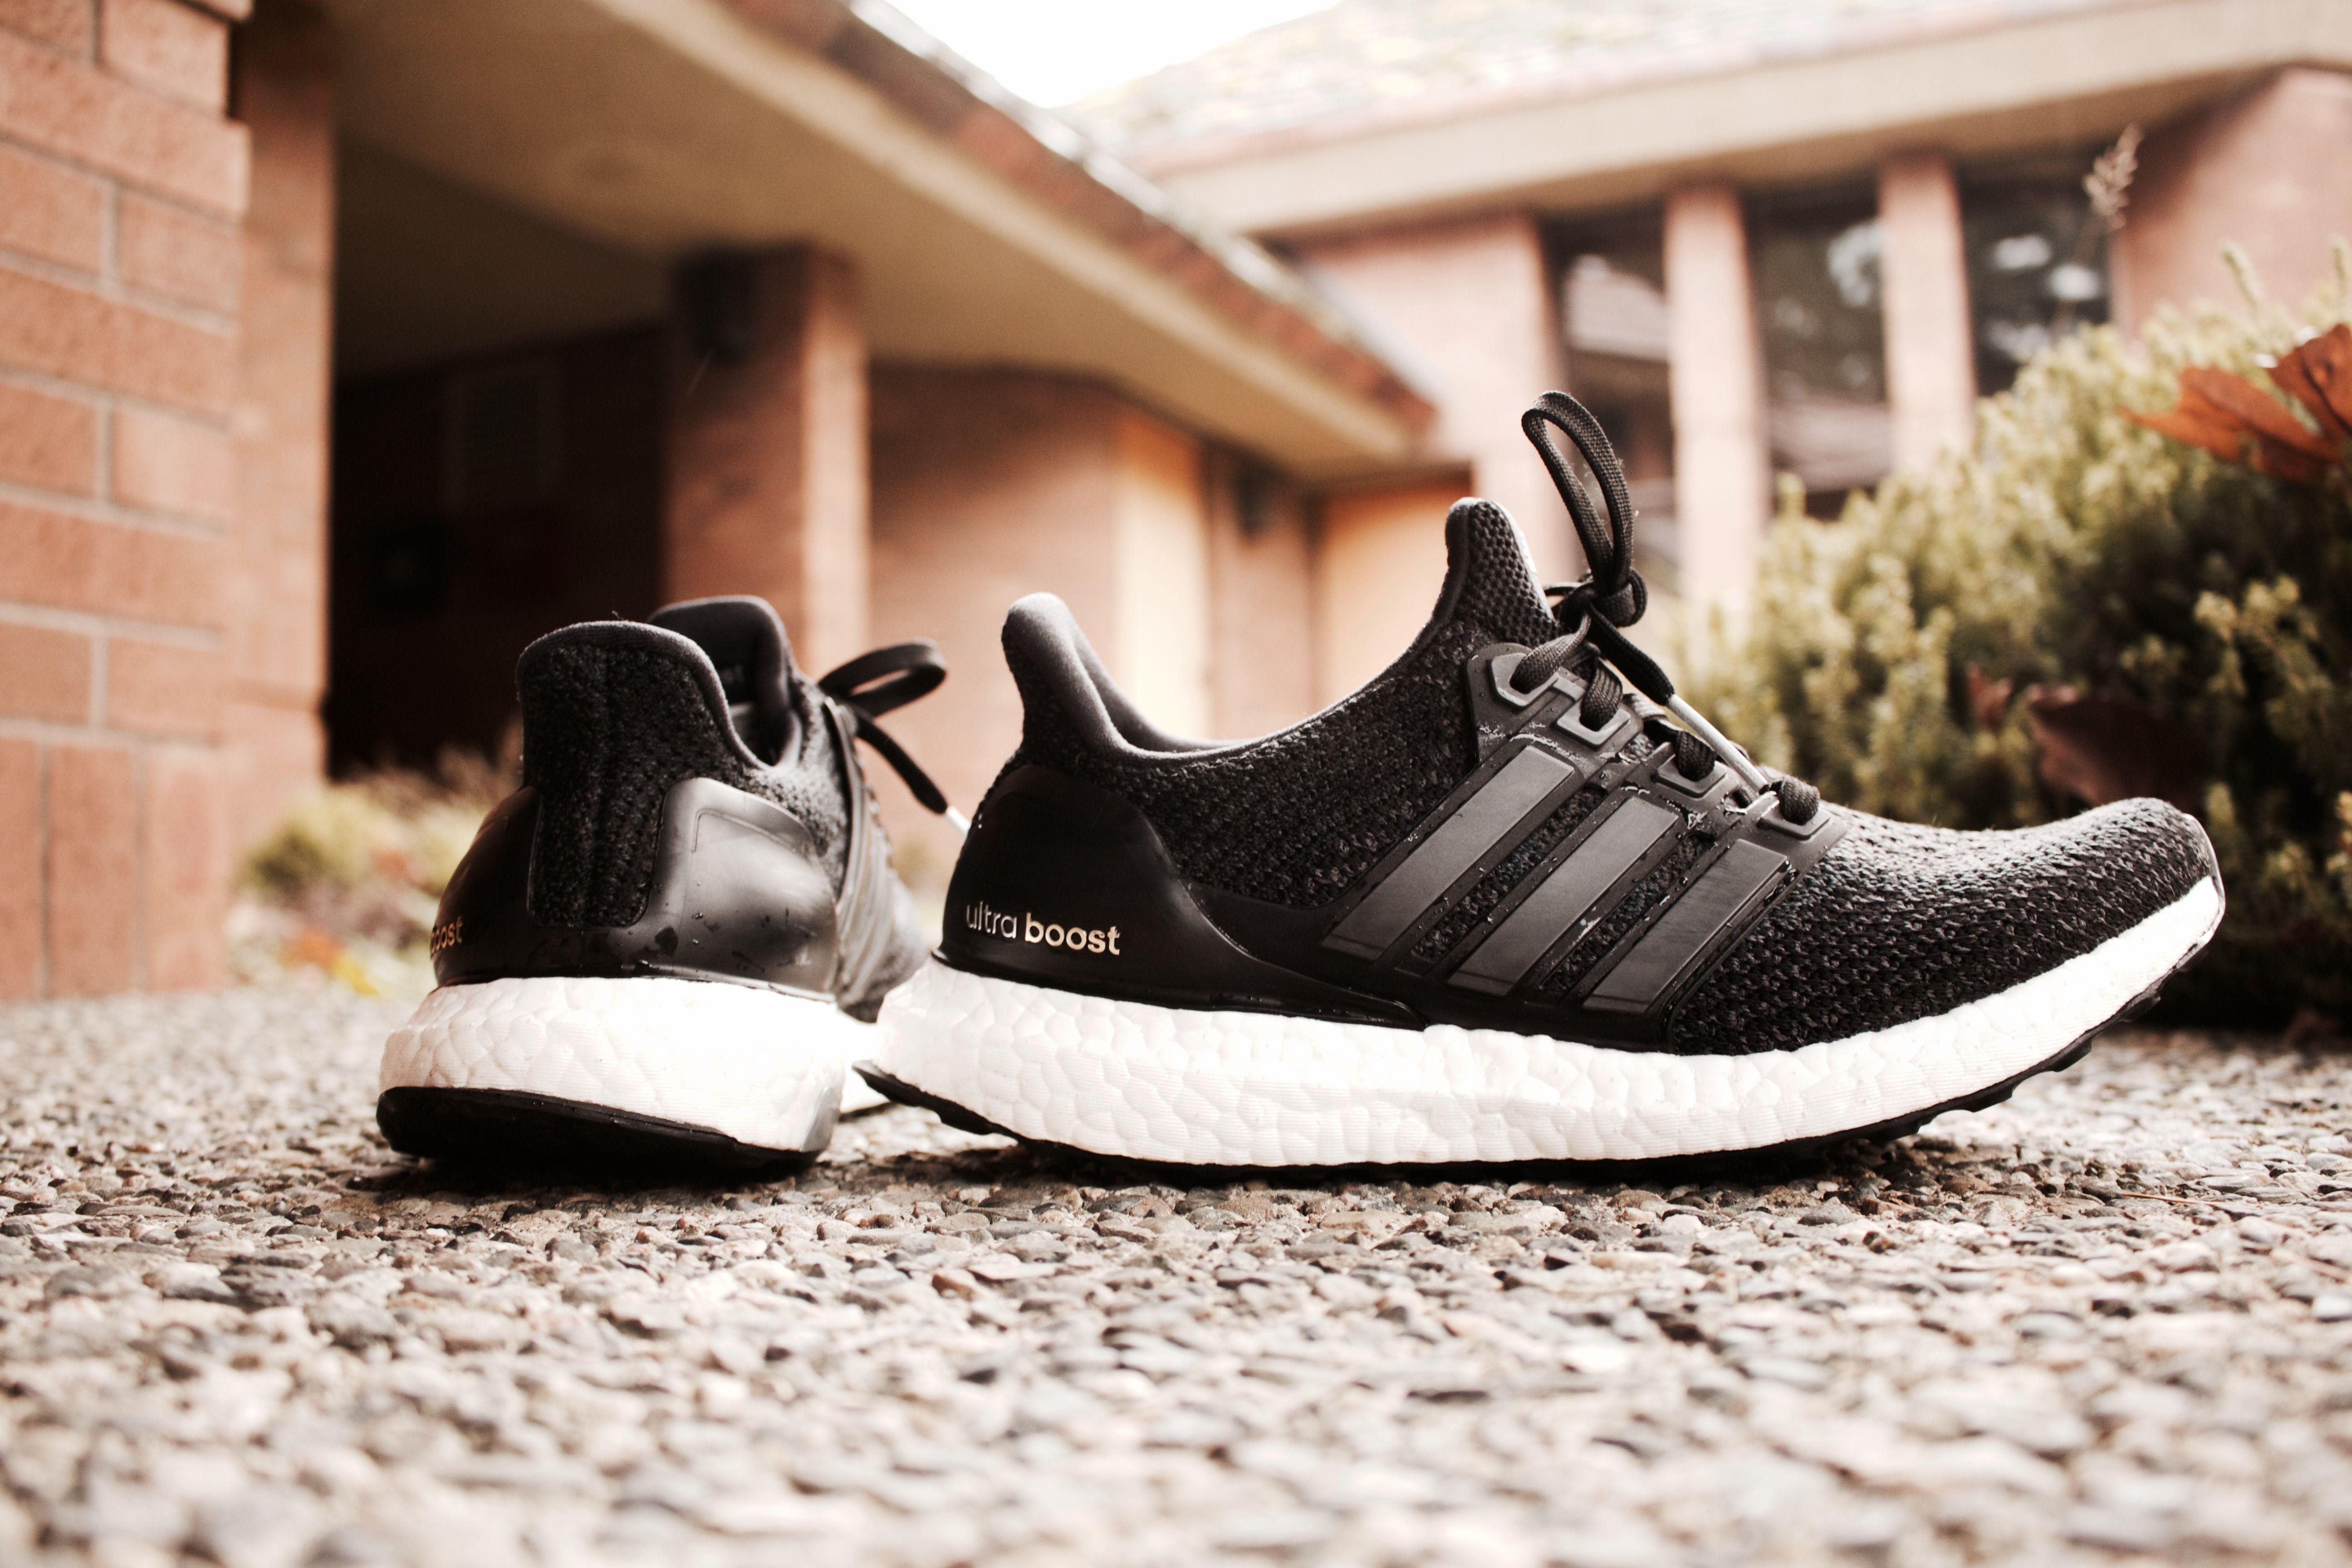 Womens Adidas Ultra Boost, Size 6, VNDS $180 | Adidas